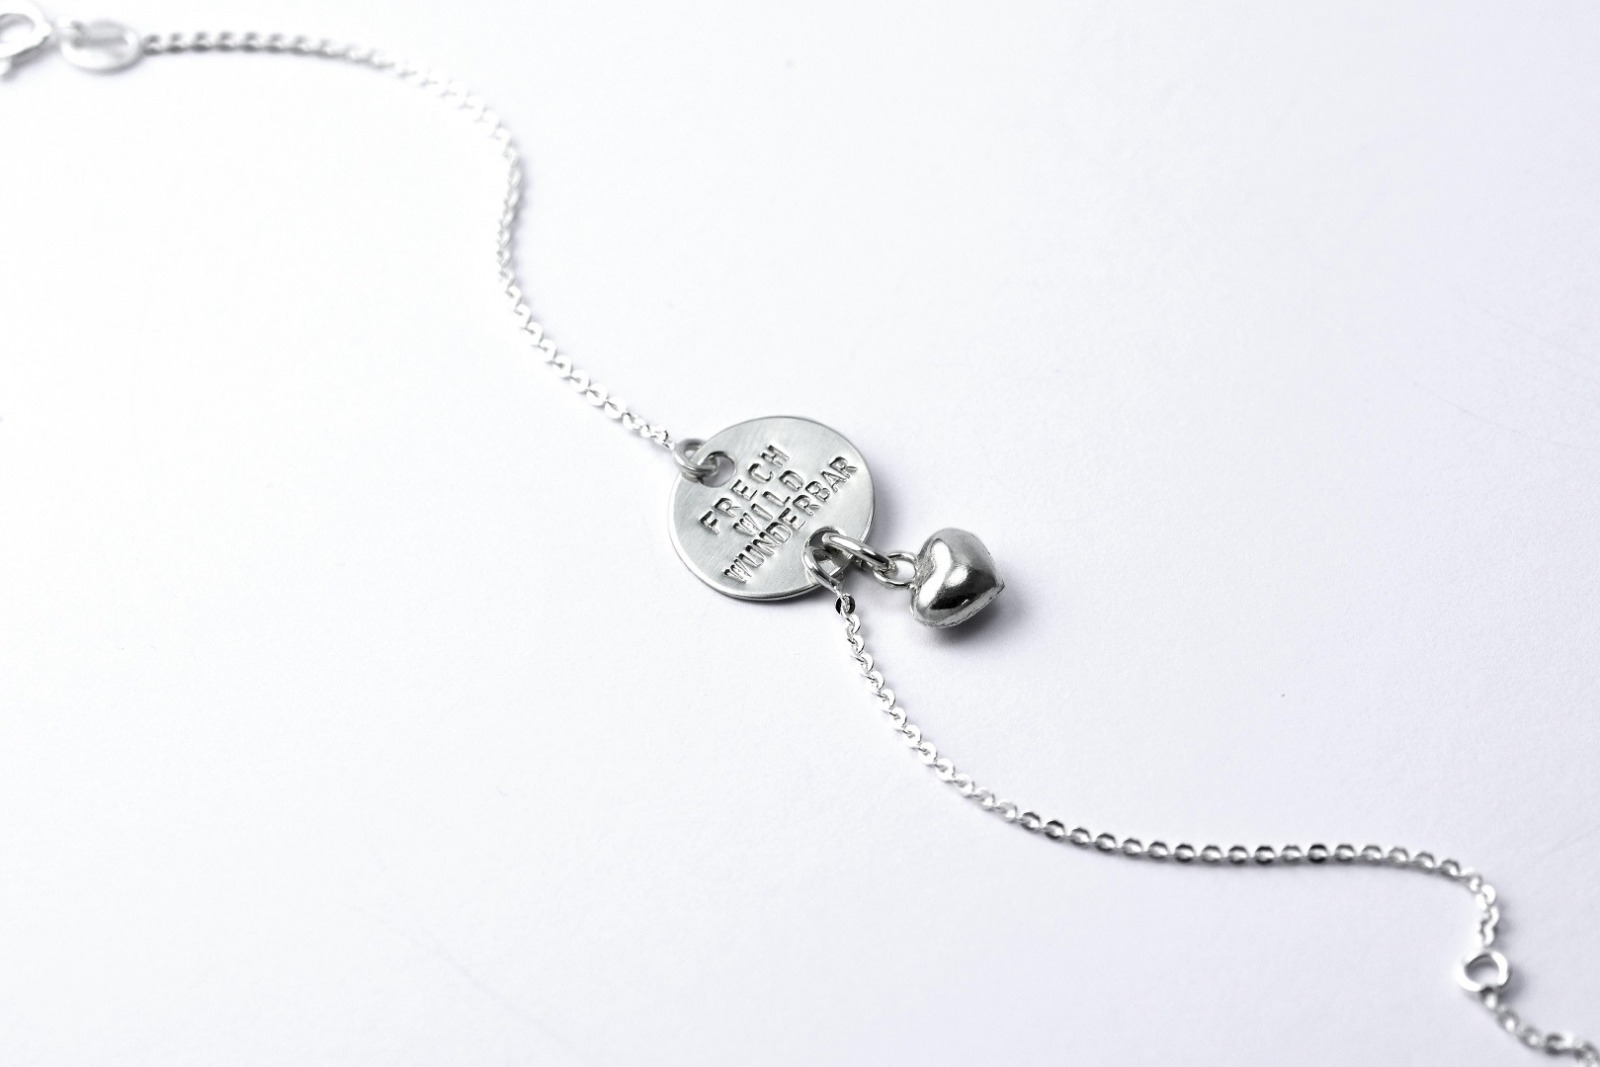 Zartes Silberarmband 1 - Namens- Geburts- - 3